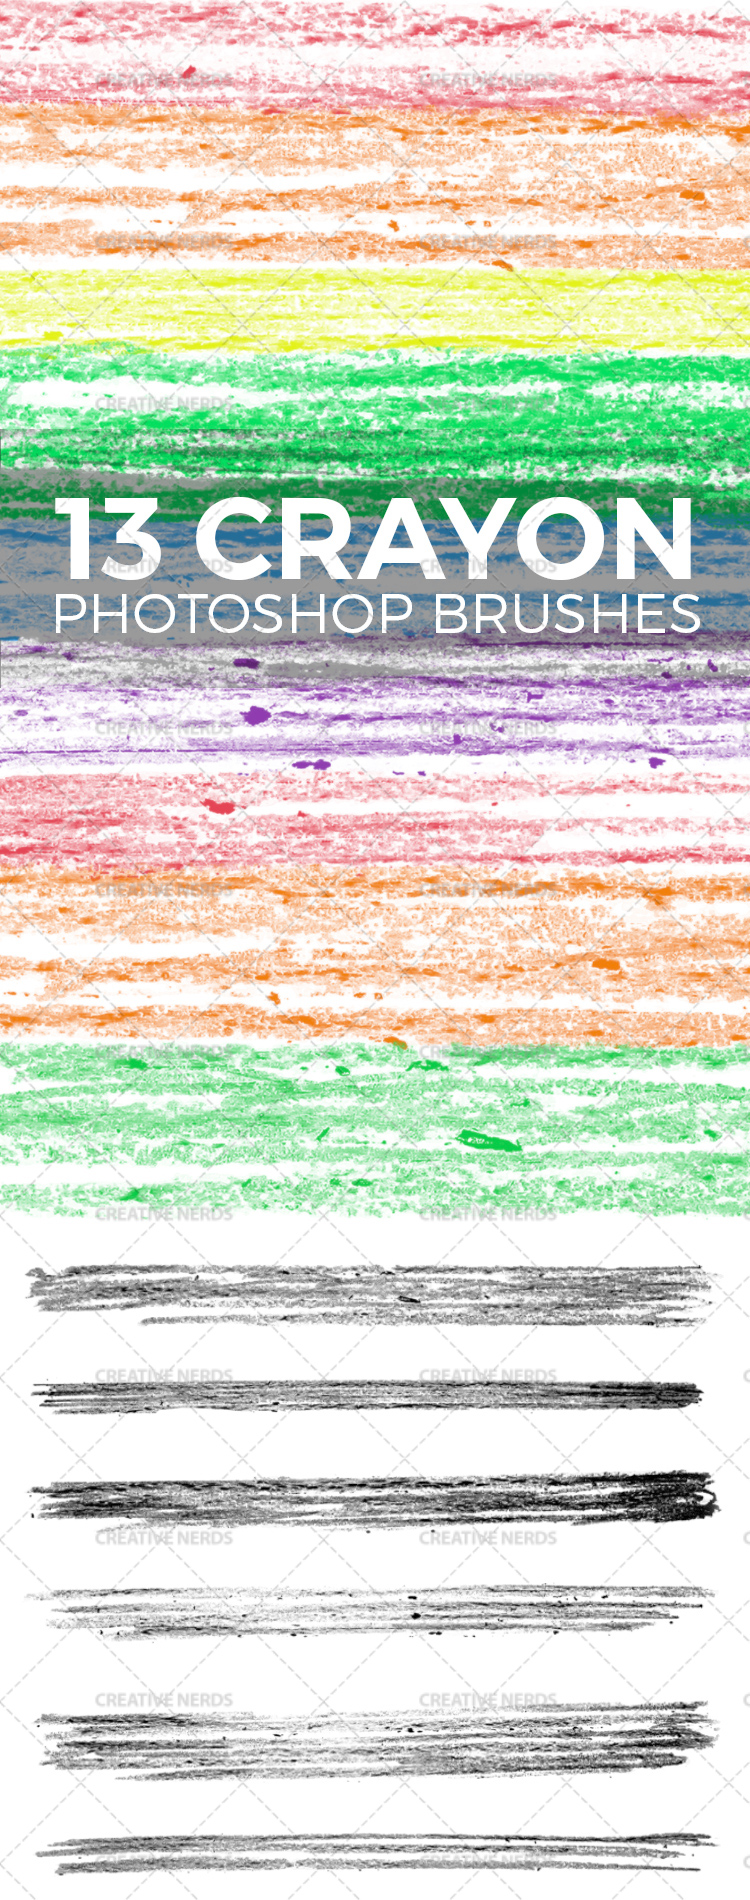 wax crayon photoshop brushes 13 Wax Crayon Photoshop brushes